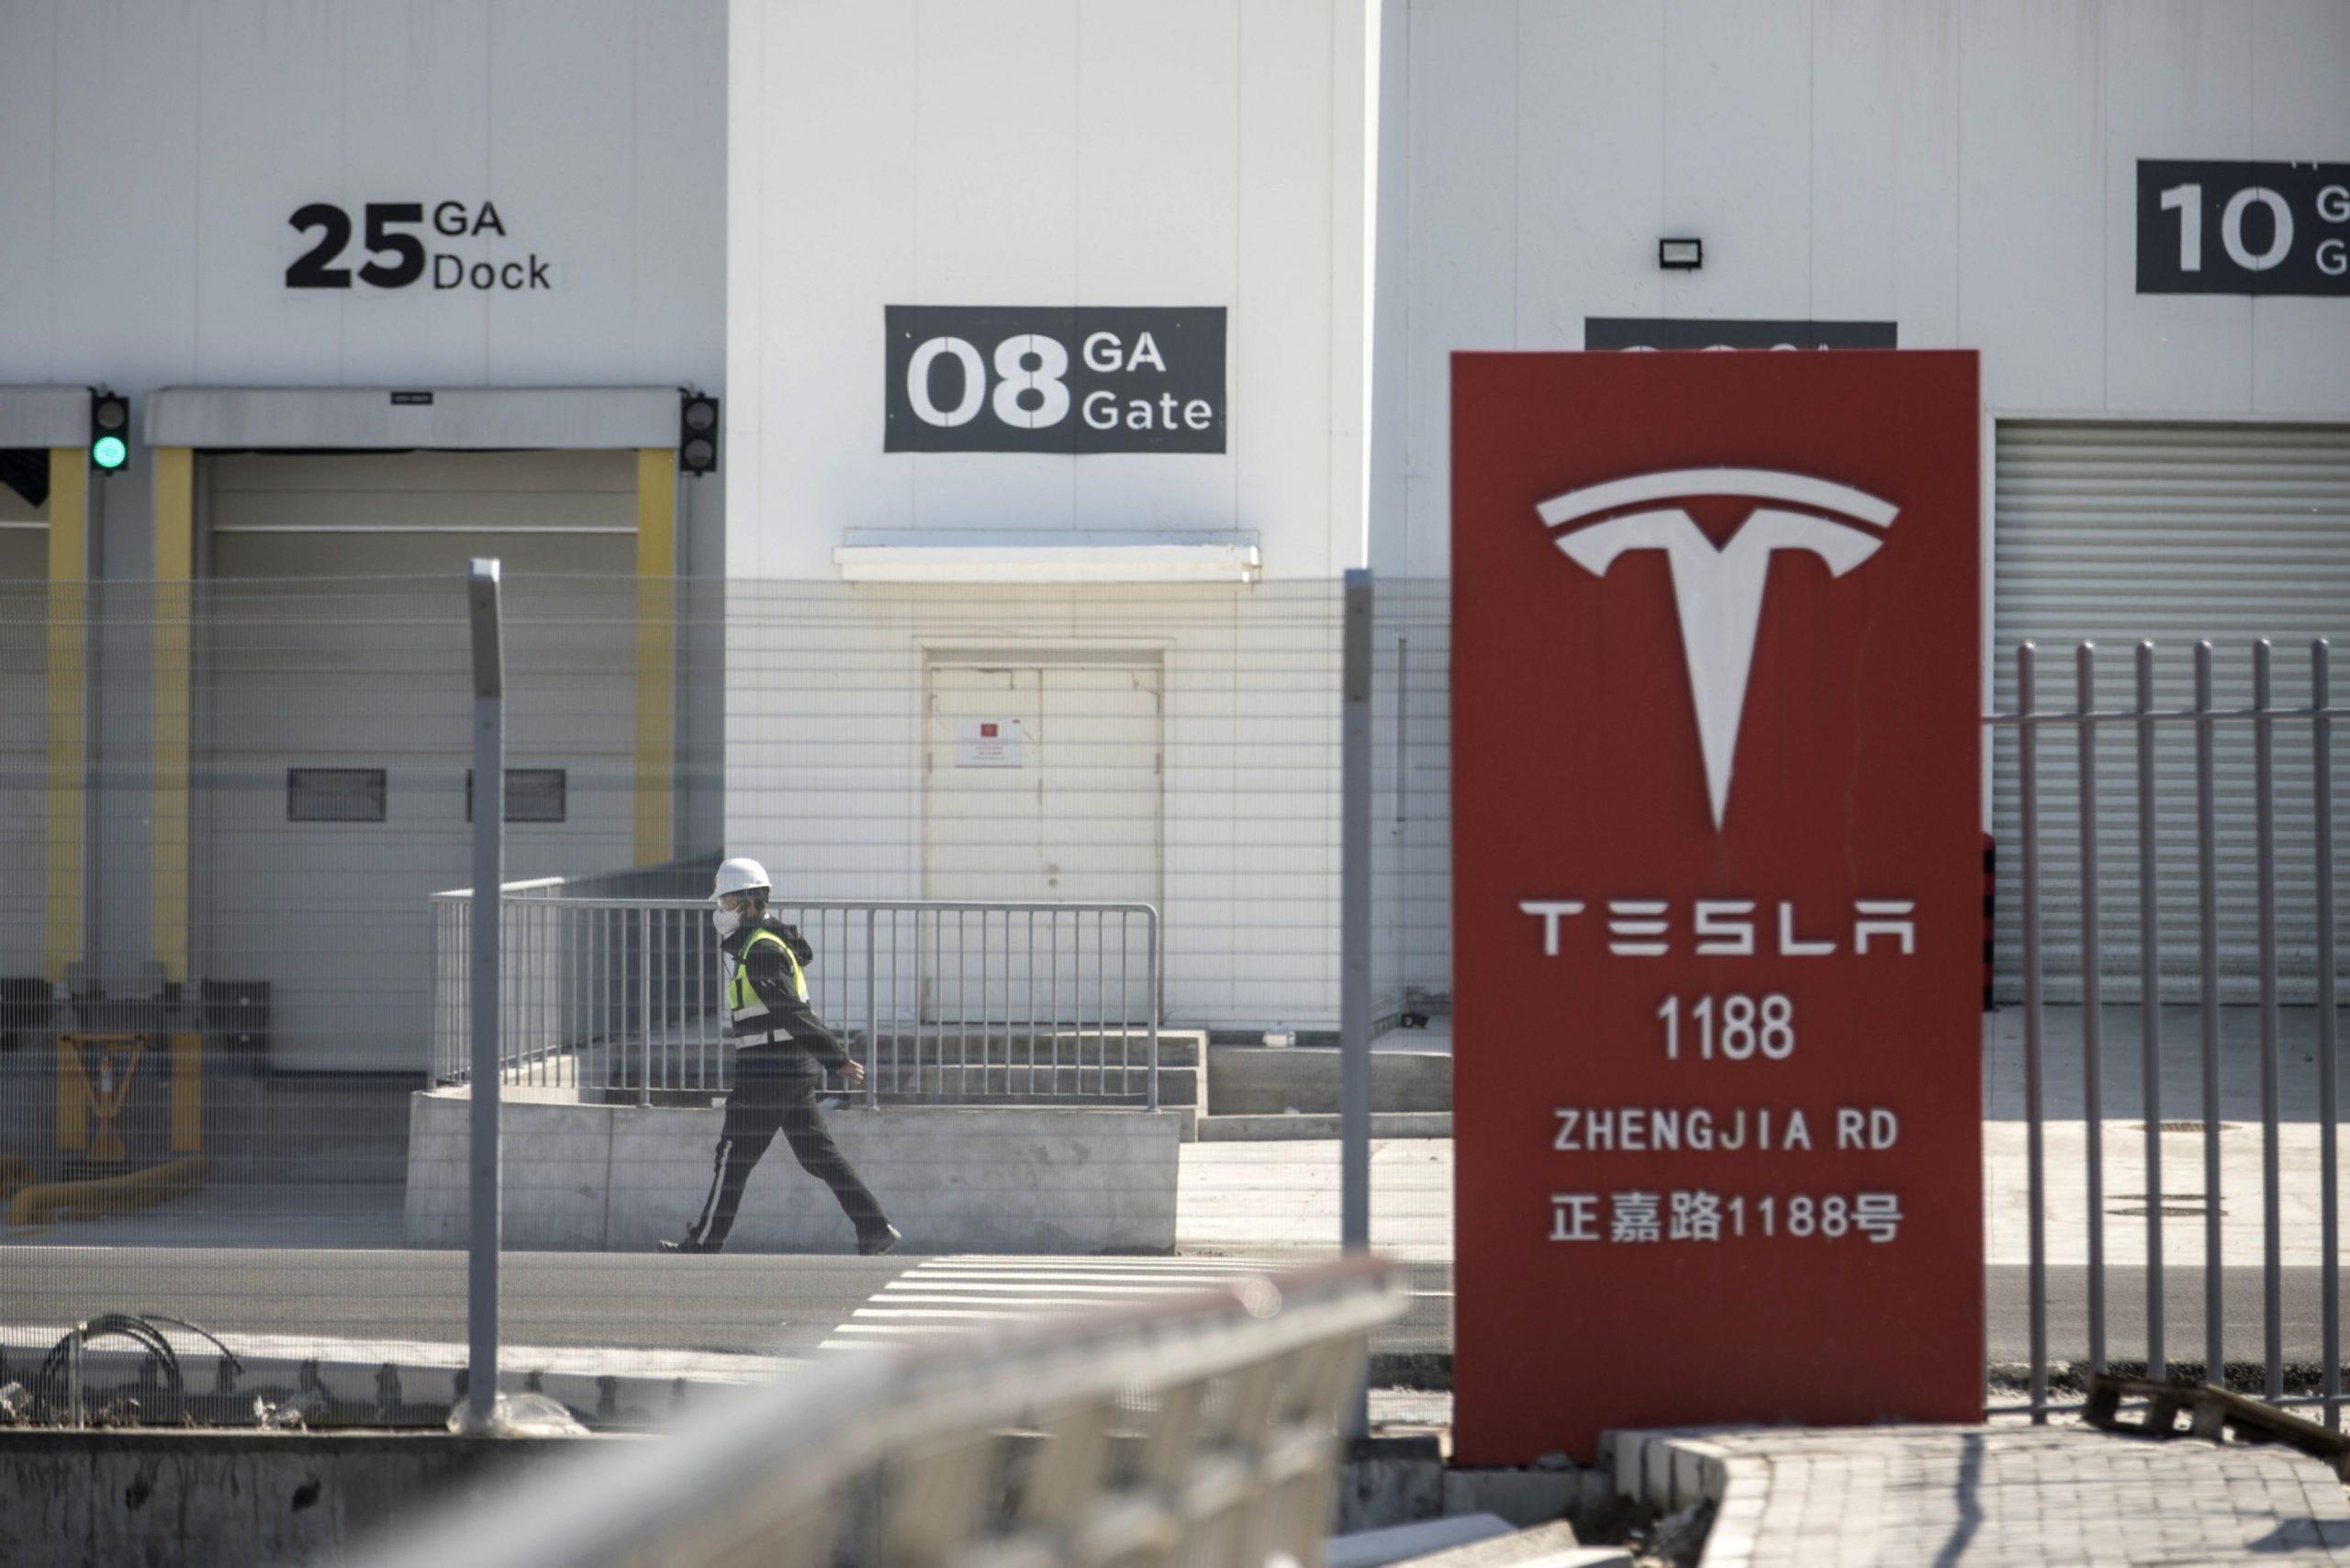 TESLA 1 scaled - استخدام نیروهای جدید در کارخانه ی Tesla مستقر در چین!